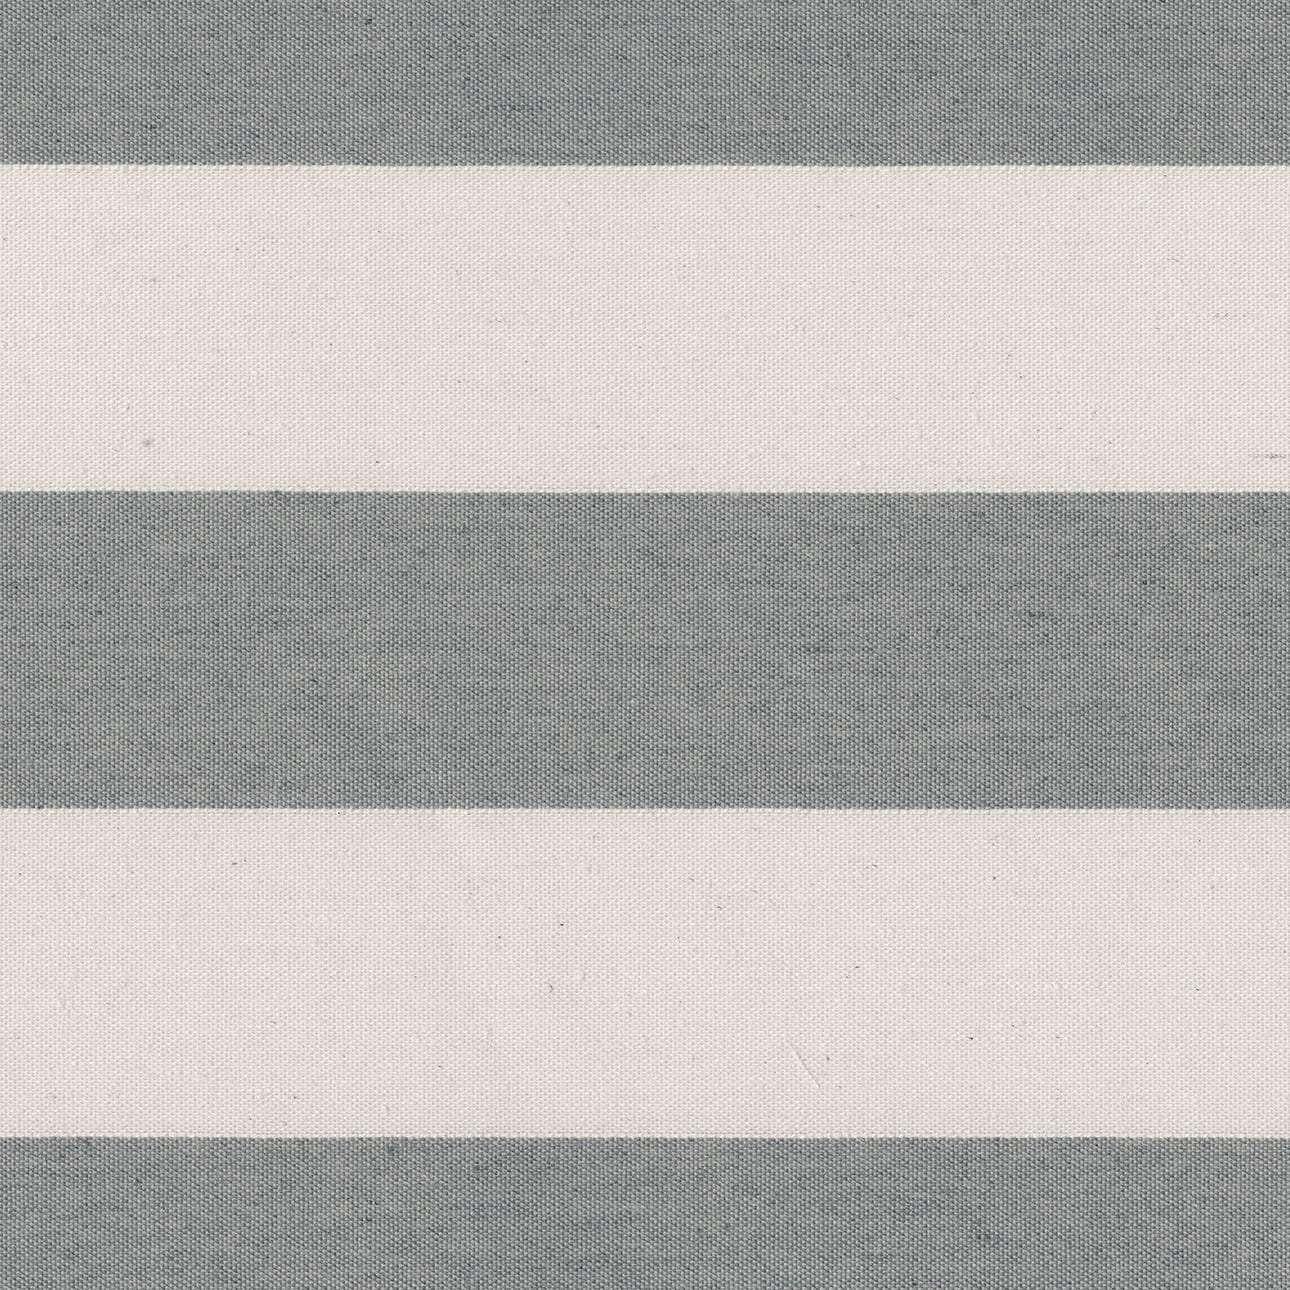 Quadro II 142-71 fra kollektionen Quadro II, Stof: 142-71